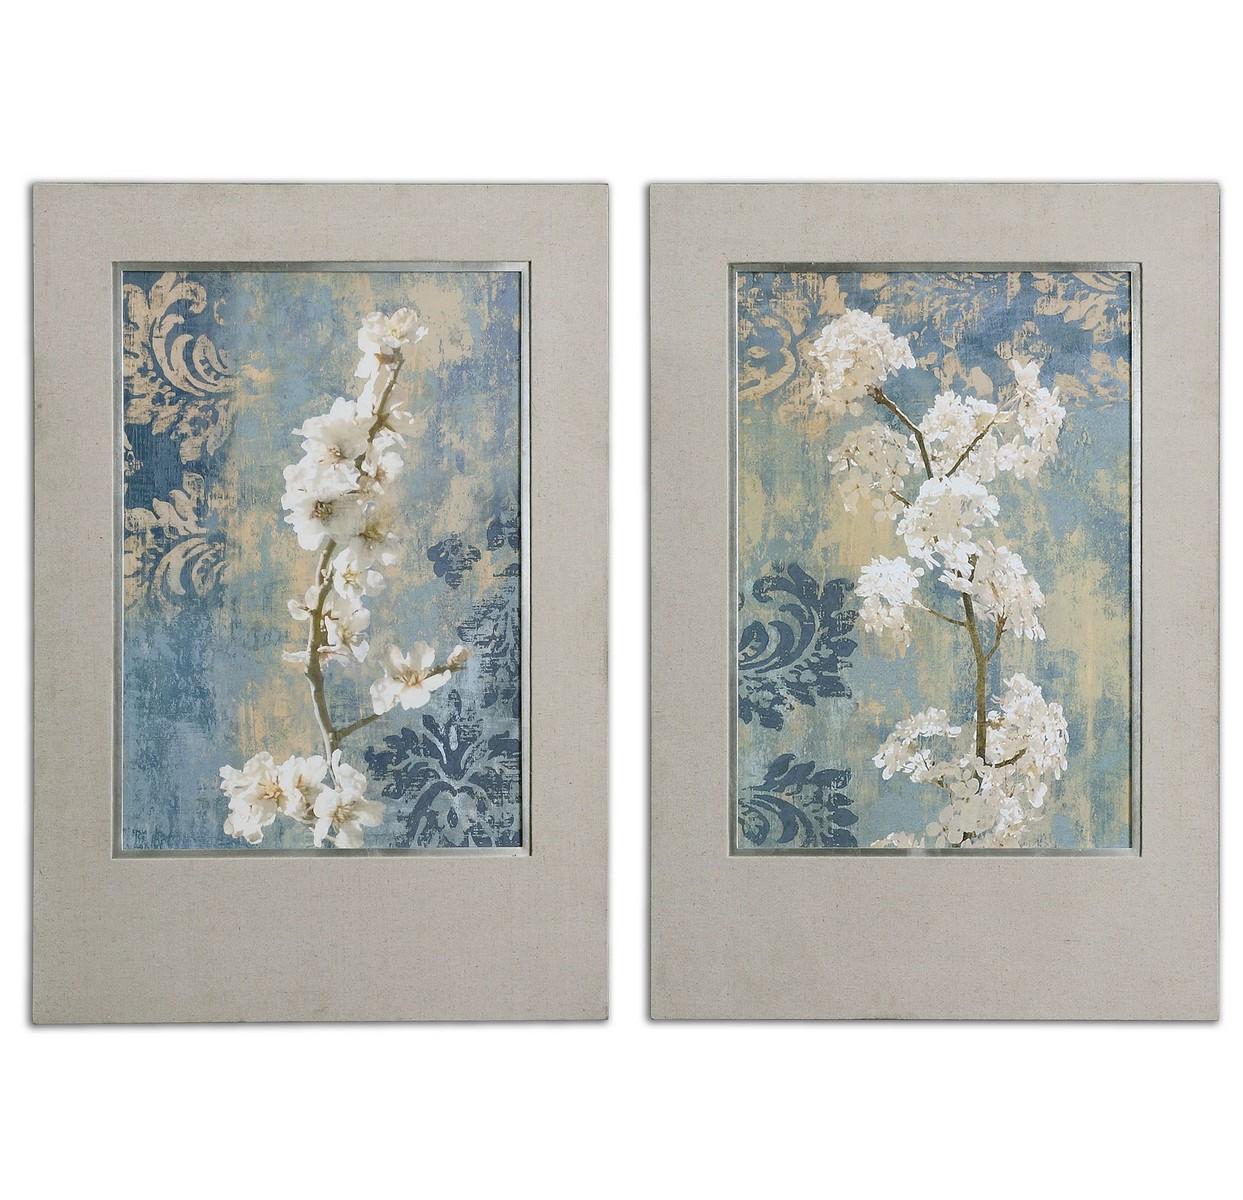 Wall Art Decor Sets: Uttermost Blossoms Framed Art